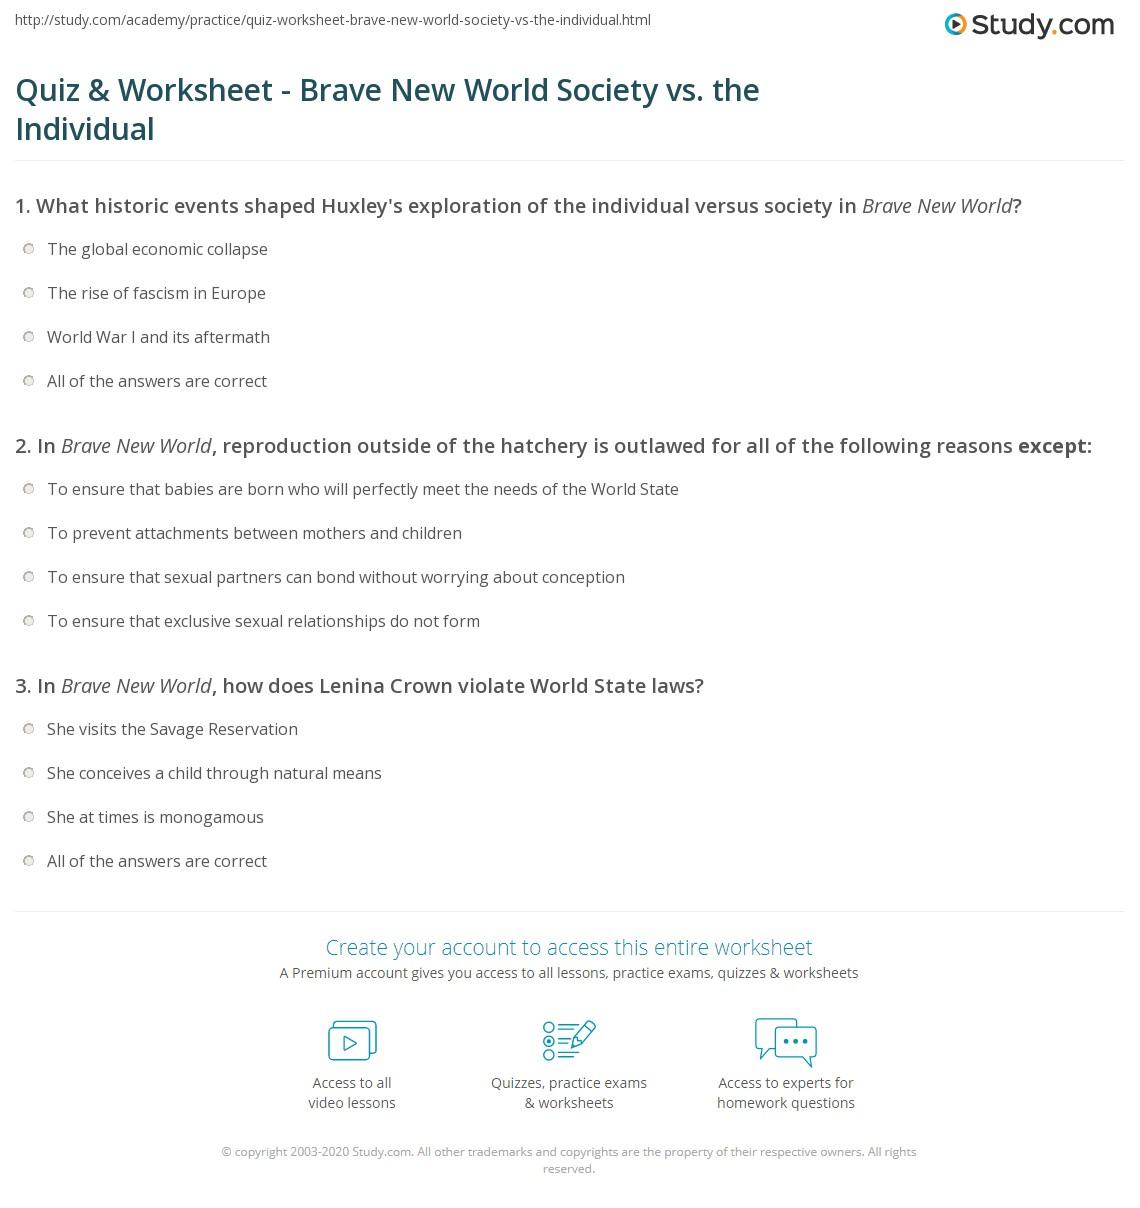 quiz worksheet brave new world society vs the individual. Black Bedroom Furniture Sets. Home Design Ideas